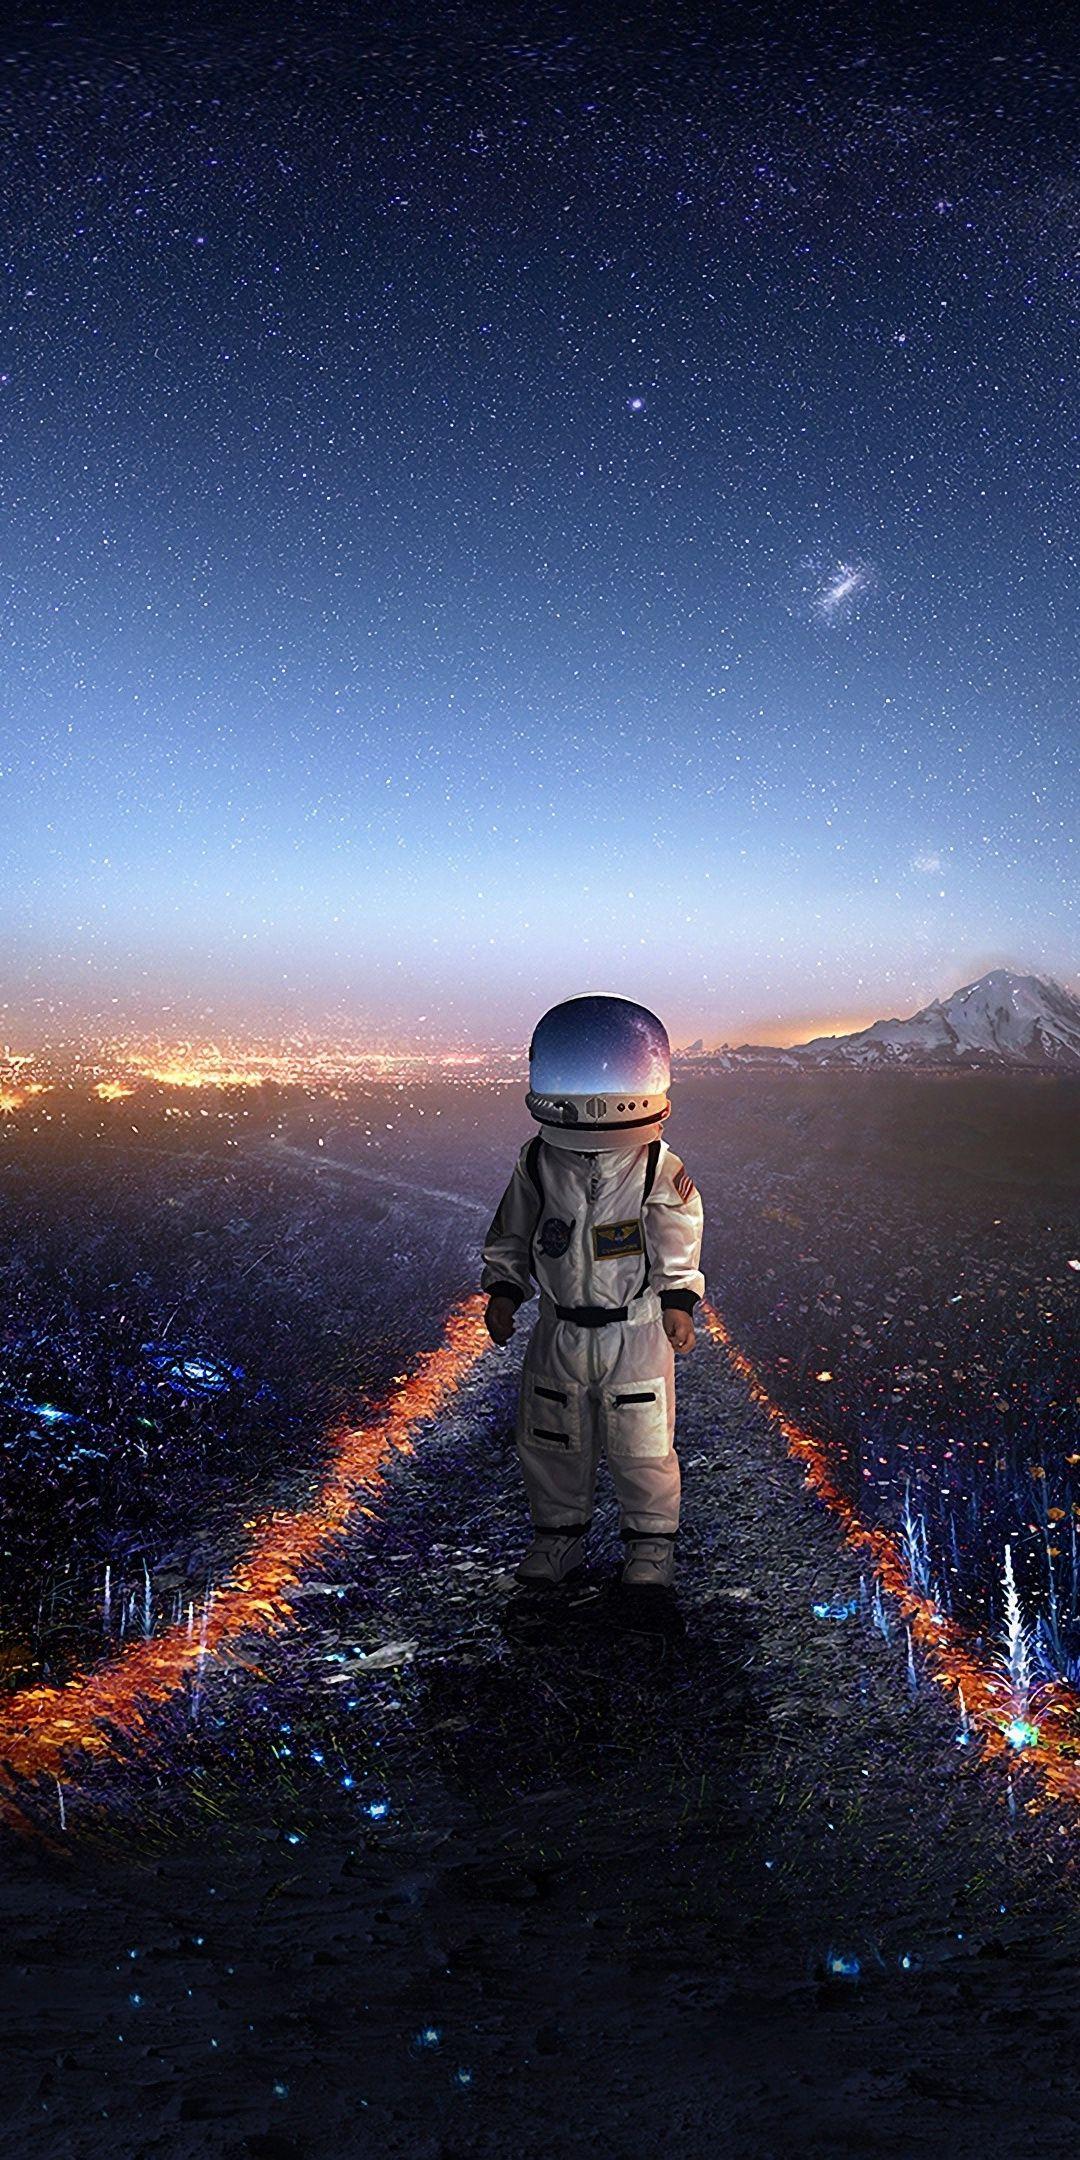 Astronaut Space Fantasy Landscape Starry Night Art 1080x2160 Wallpaper Astronaut Wallpaper Space Artwork Astronaut Art